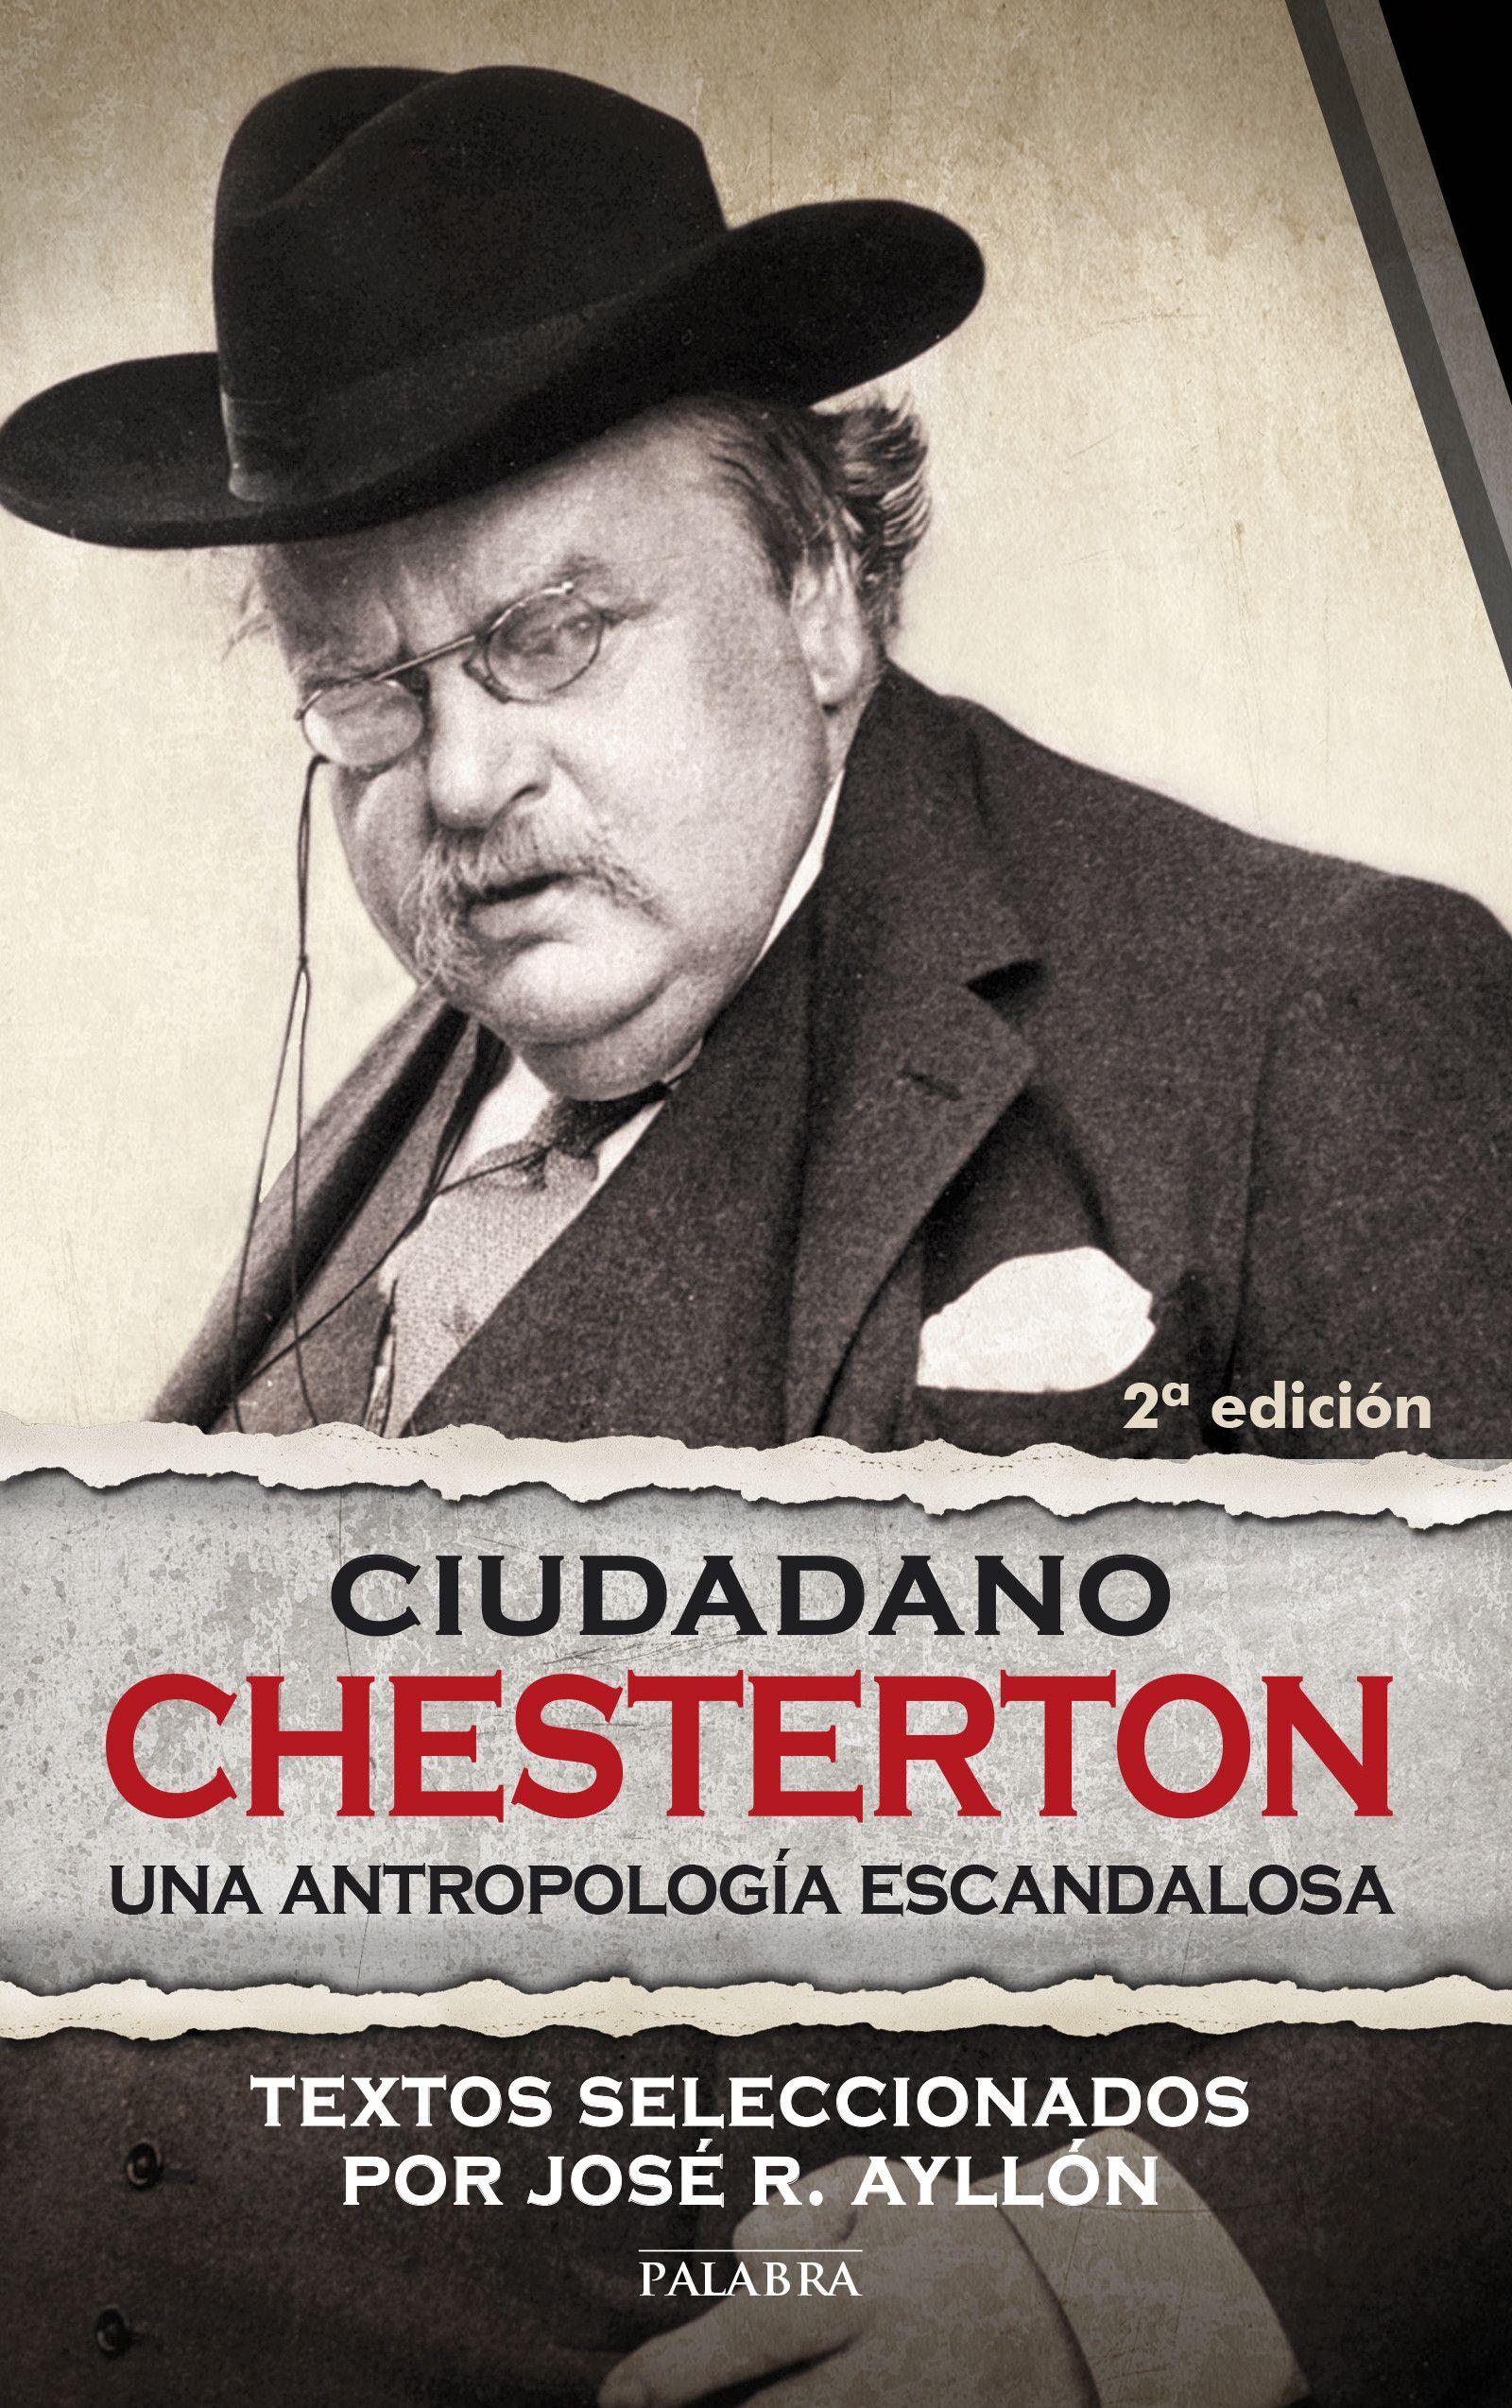 Ciudadano Chesterton